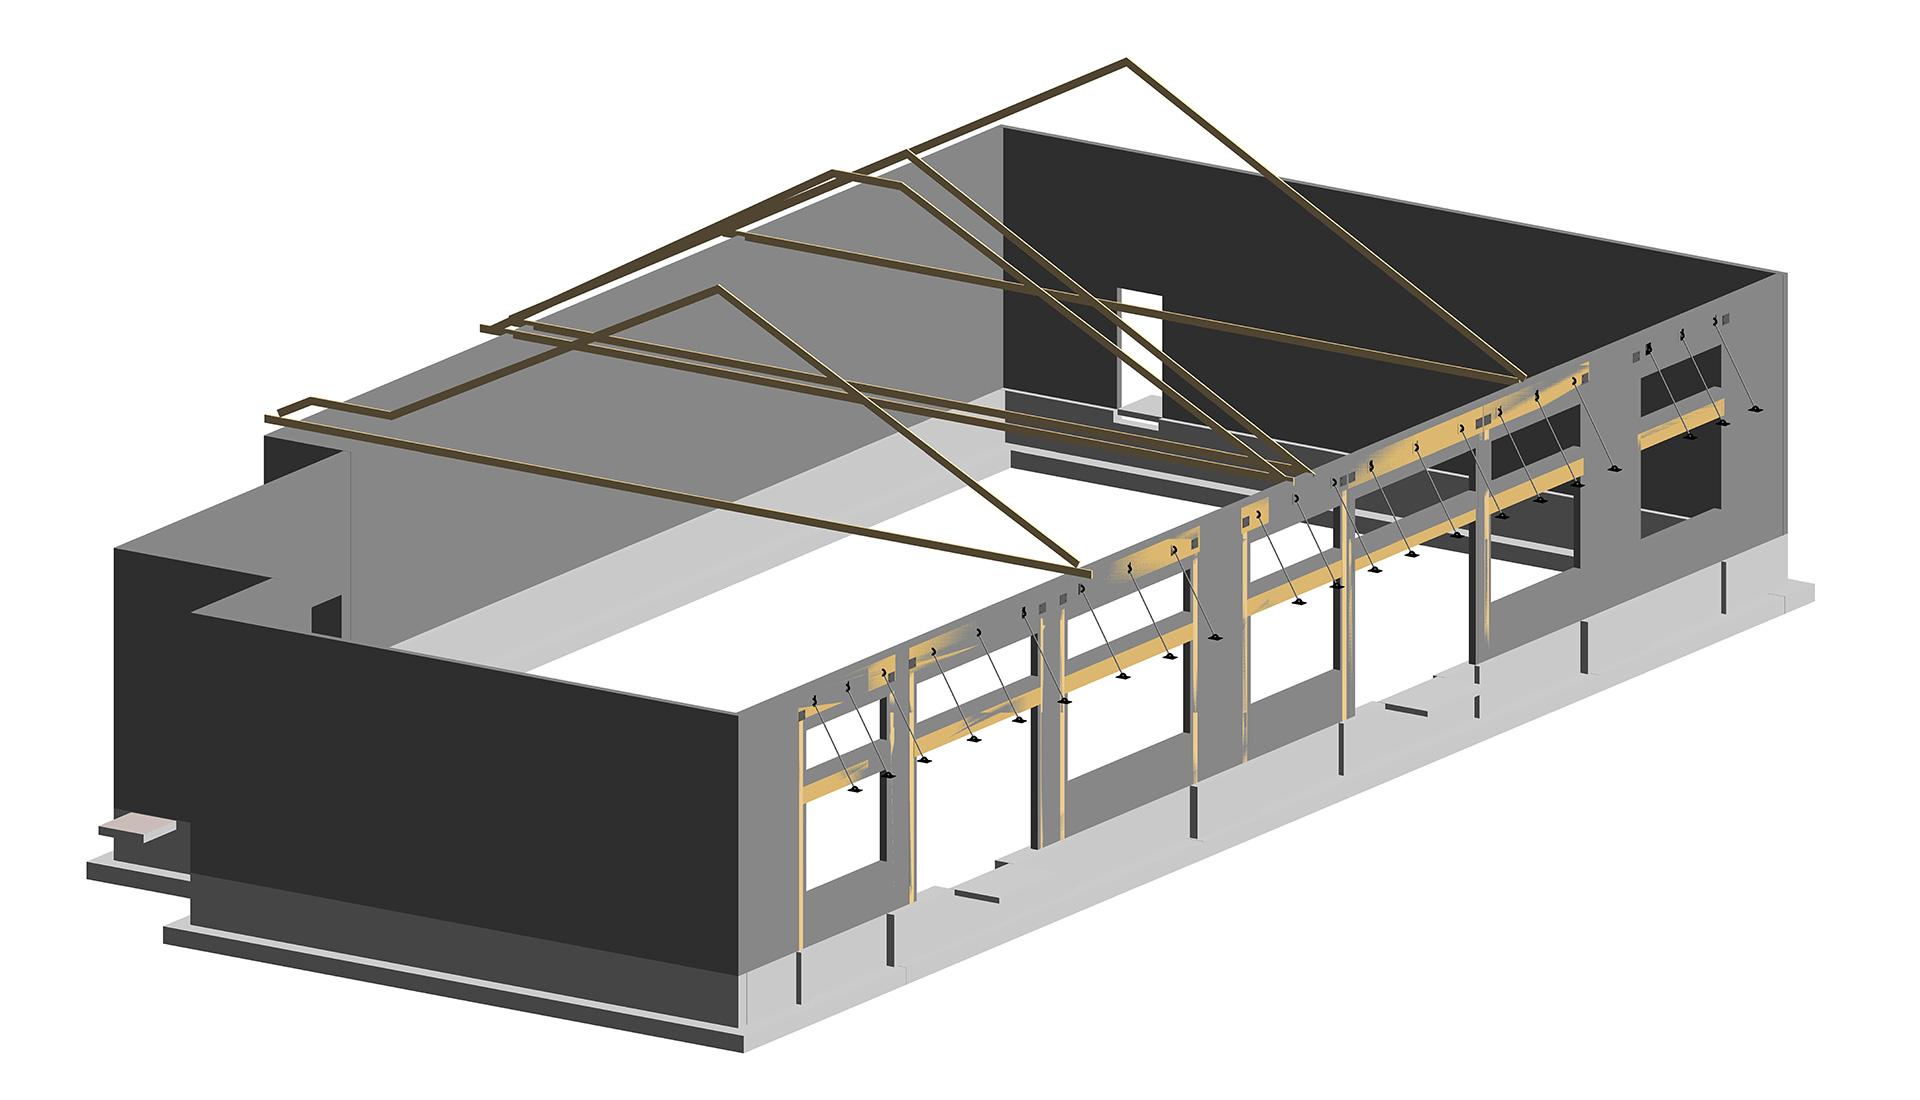 Architectural-Revit-Modeling-Silver_lane_Gas_Station-BIM-Project-by_United-BIM